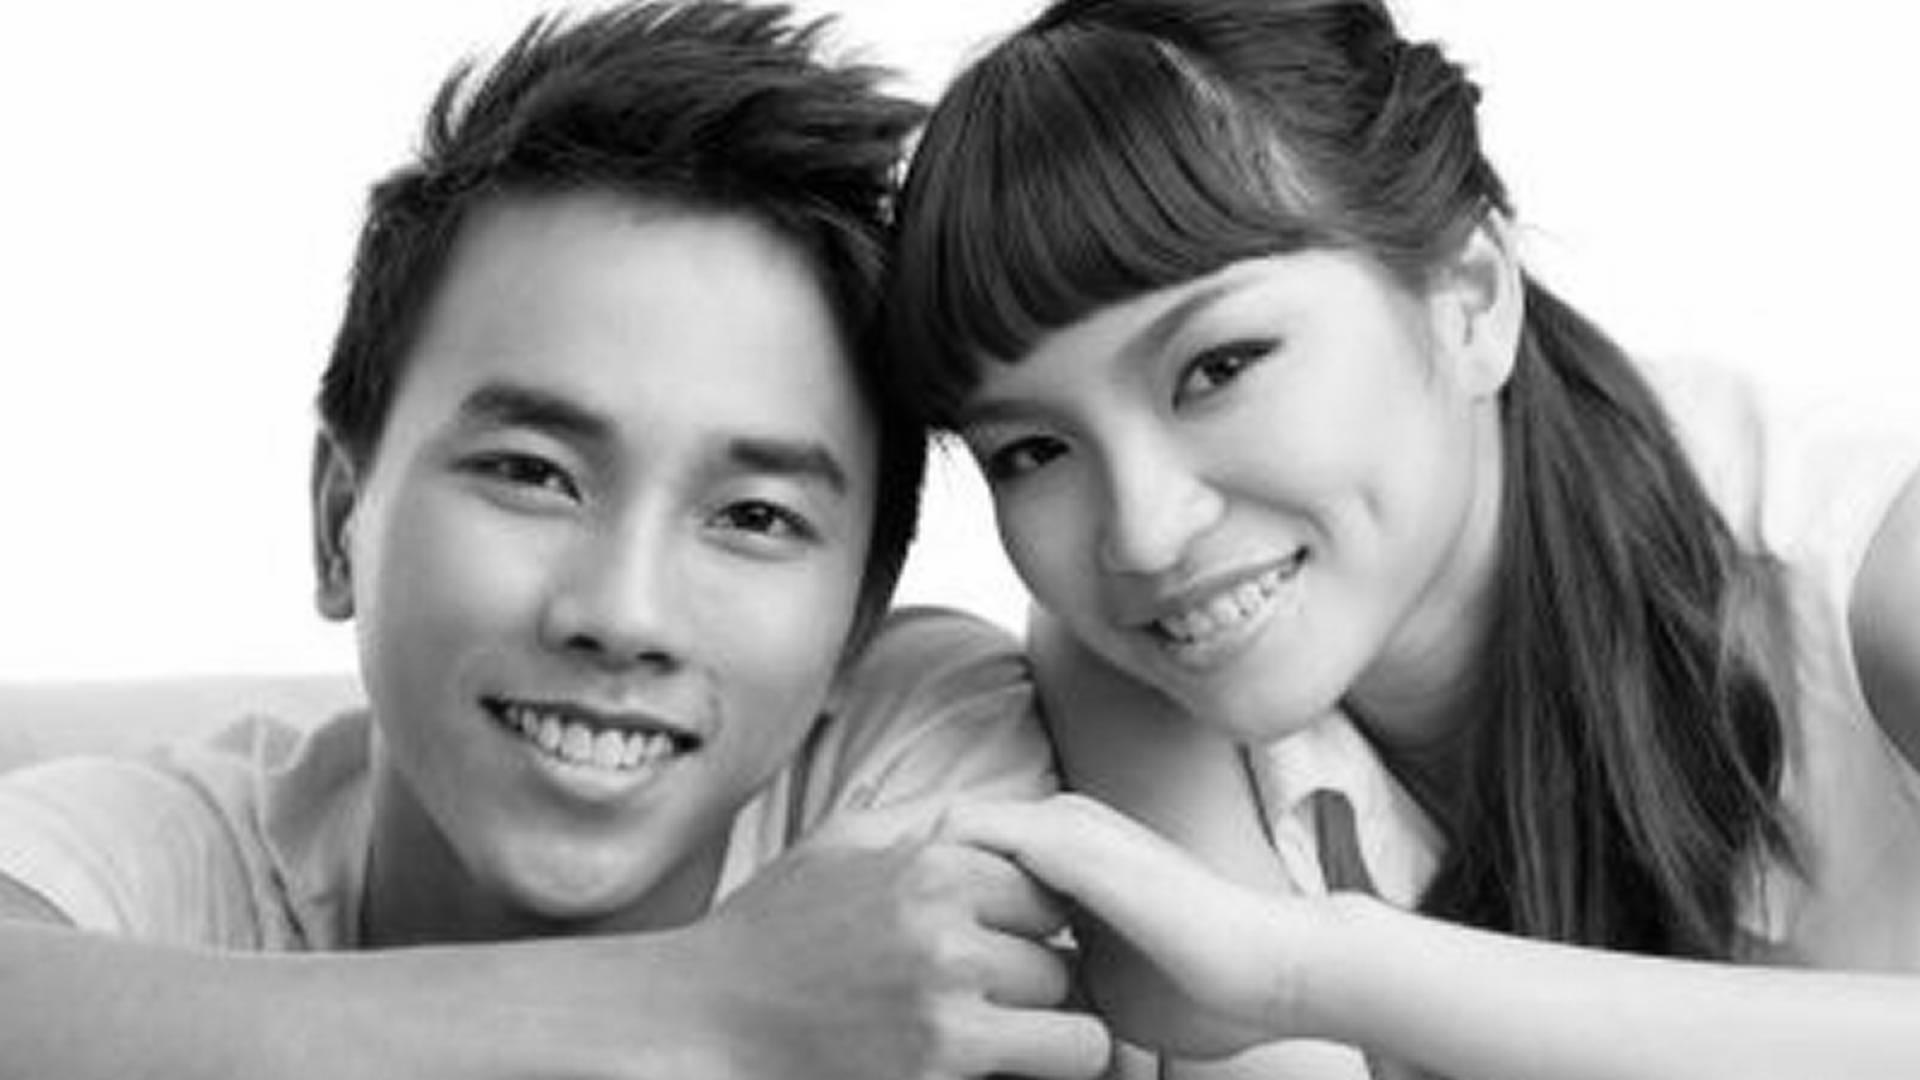 Christian Aasian dating UK